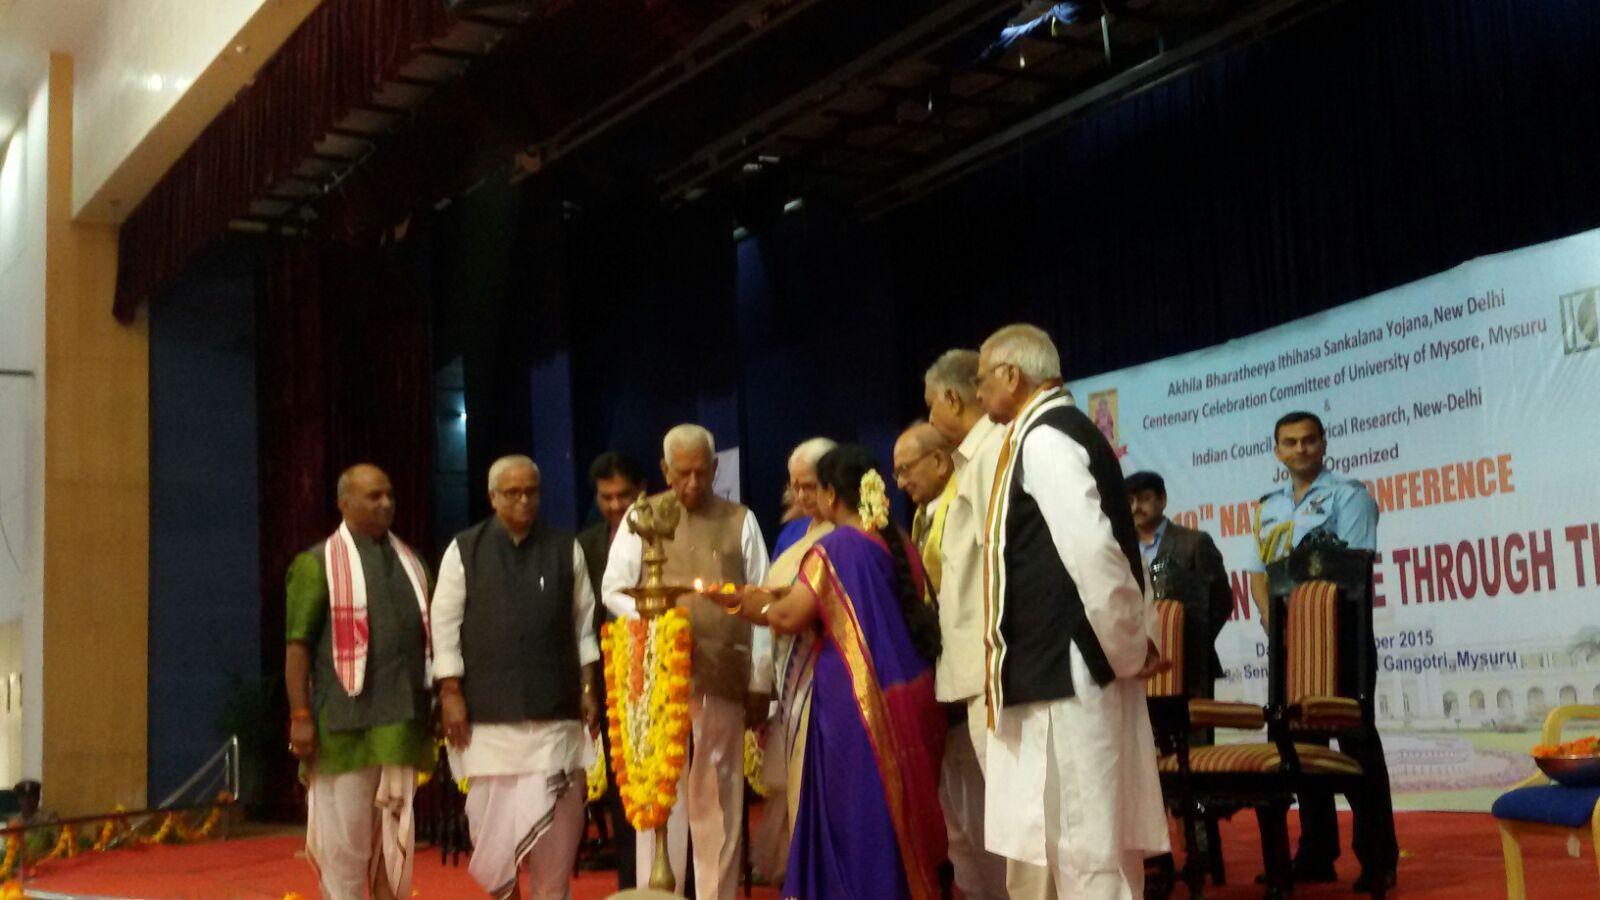 Itihas Sankalan Samiti's 10th National Conference begins at Mysuru; attended by Goa&Karnataka Governors, RSS Sarakaryavah Bhaiyyaji Joshi